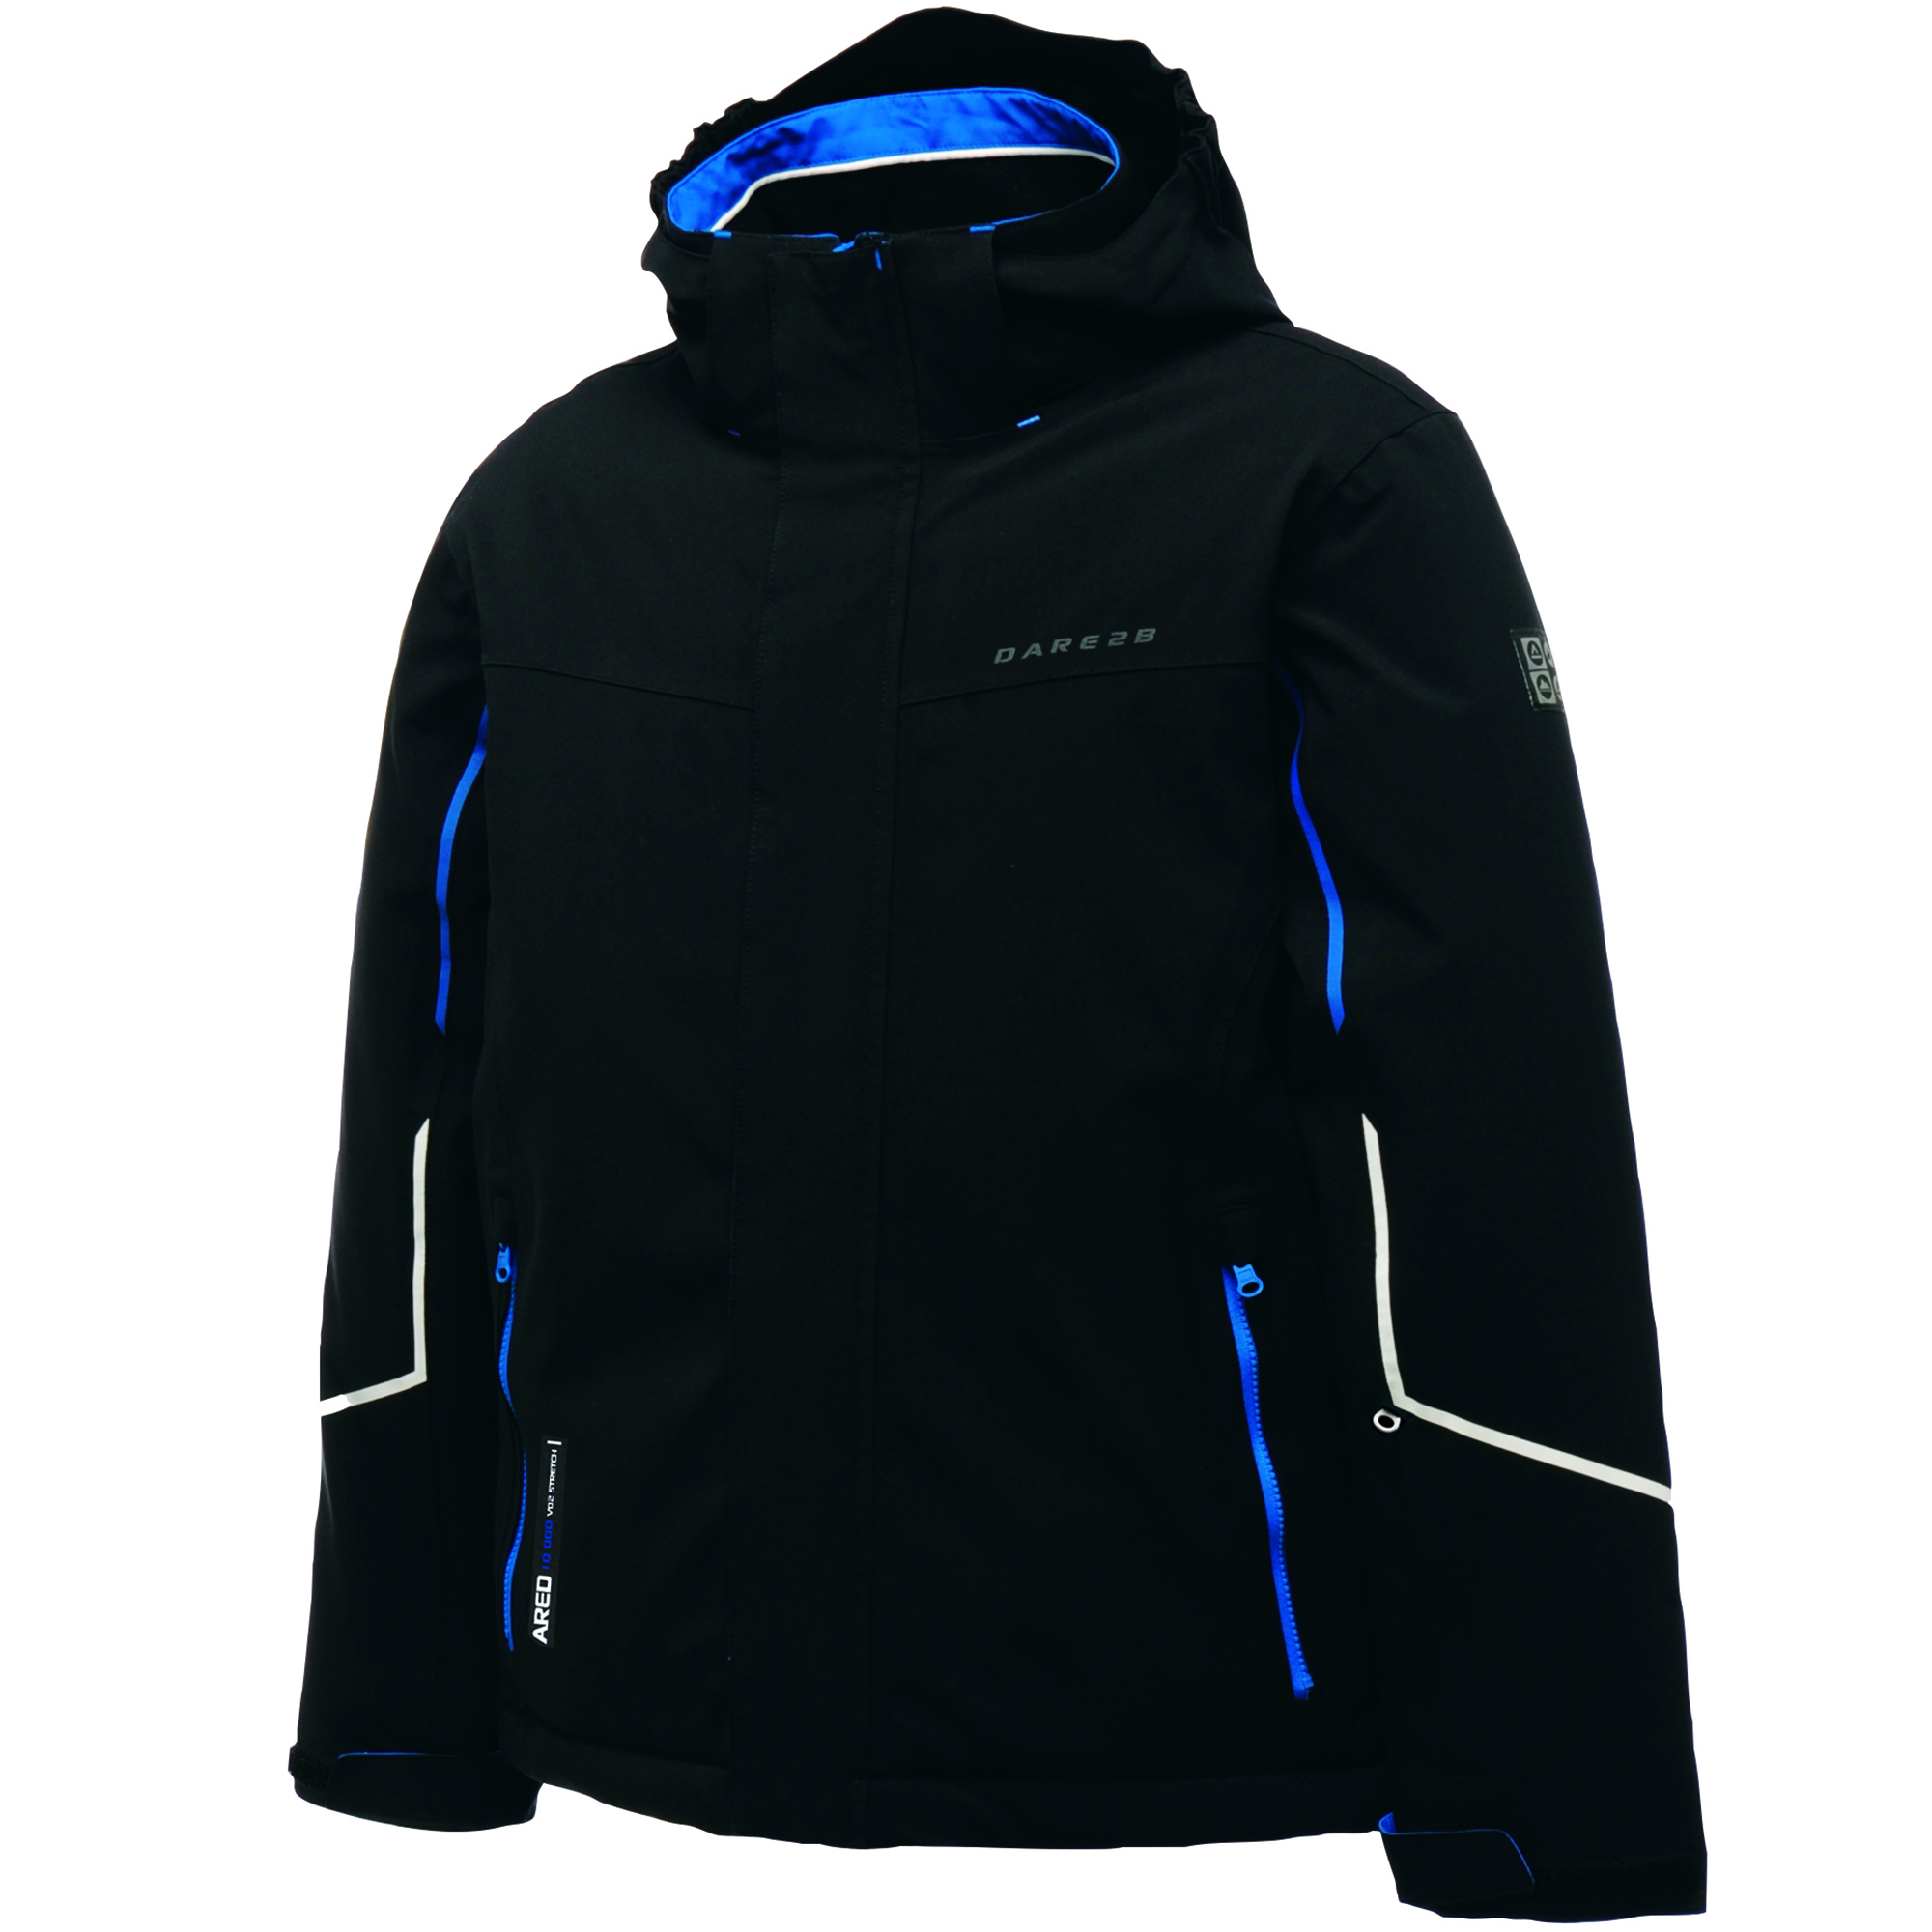 Rumble Dare2b Unisex Ski Jacket